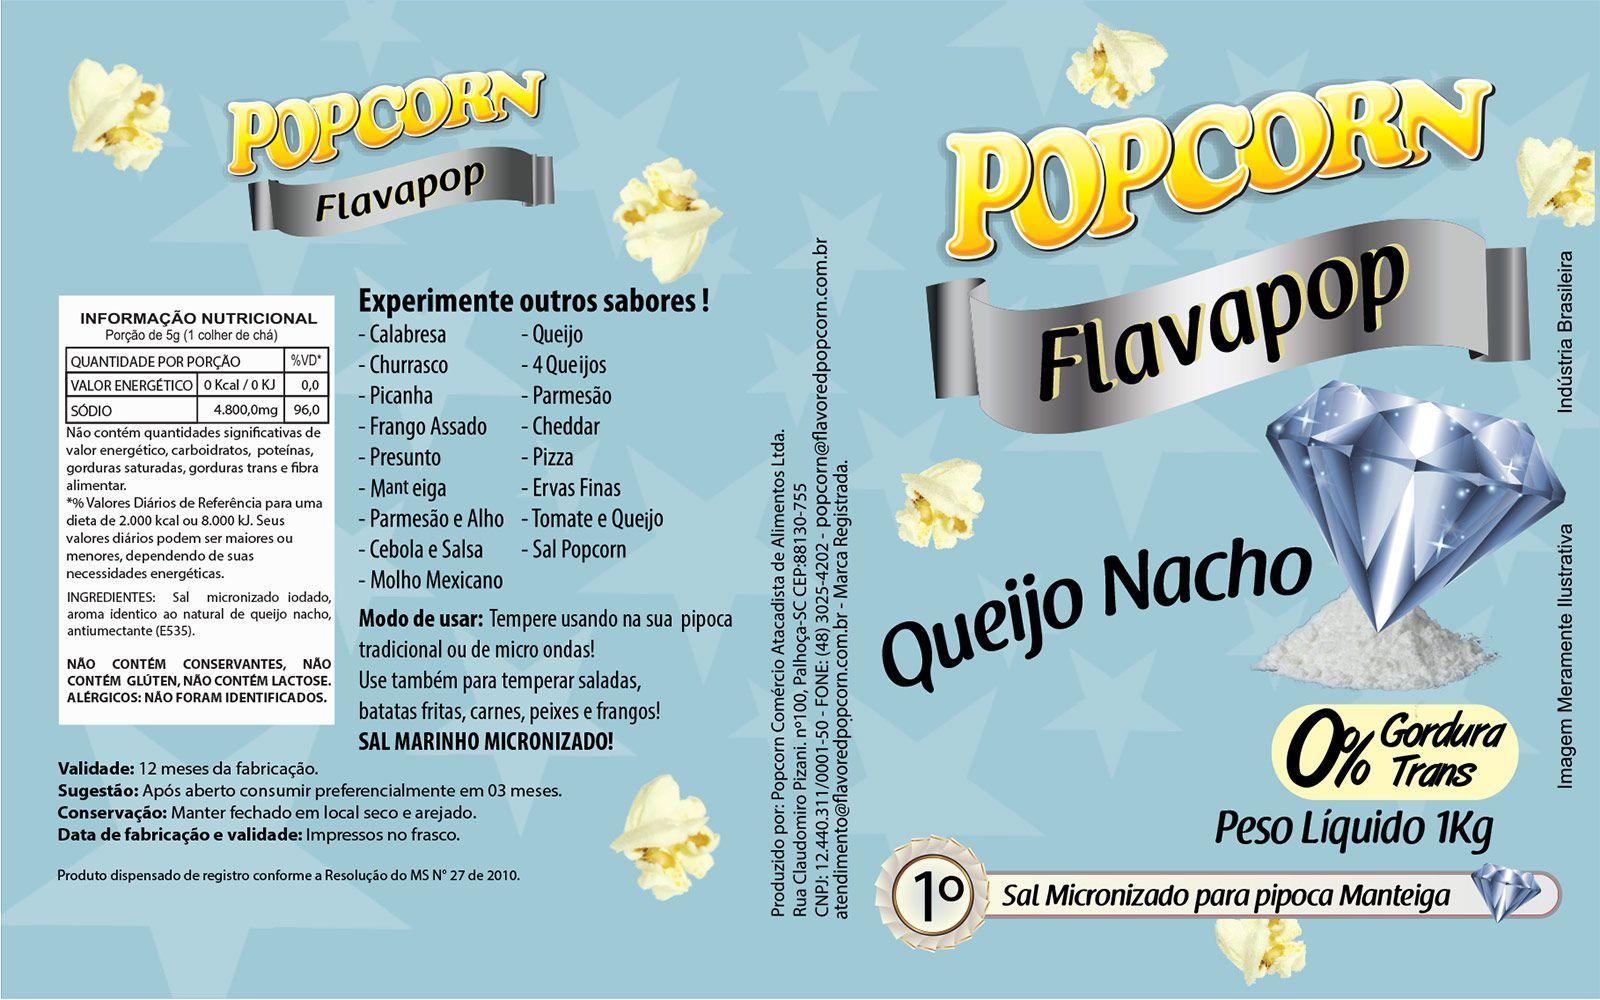 FLAVAPOP - Original de cinema - Queijo Nacho - Micronizado Popcorn  - Pct 1kg